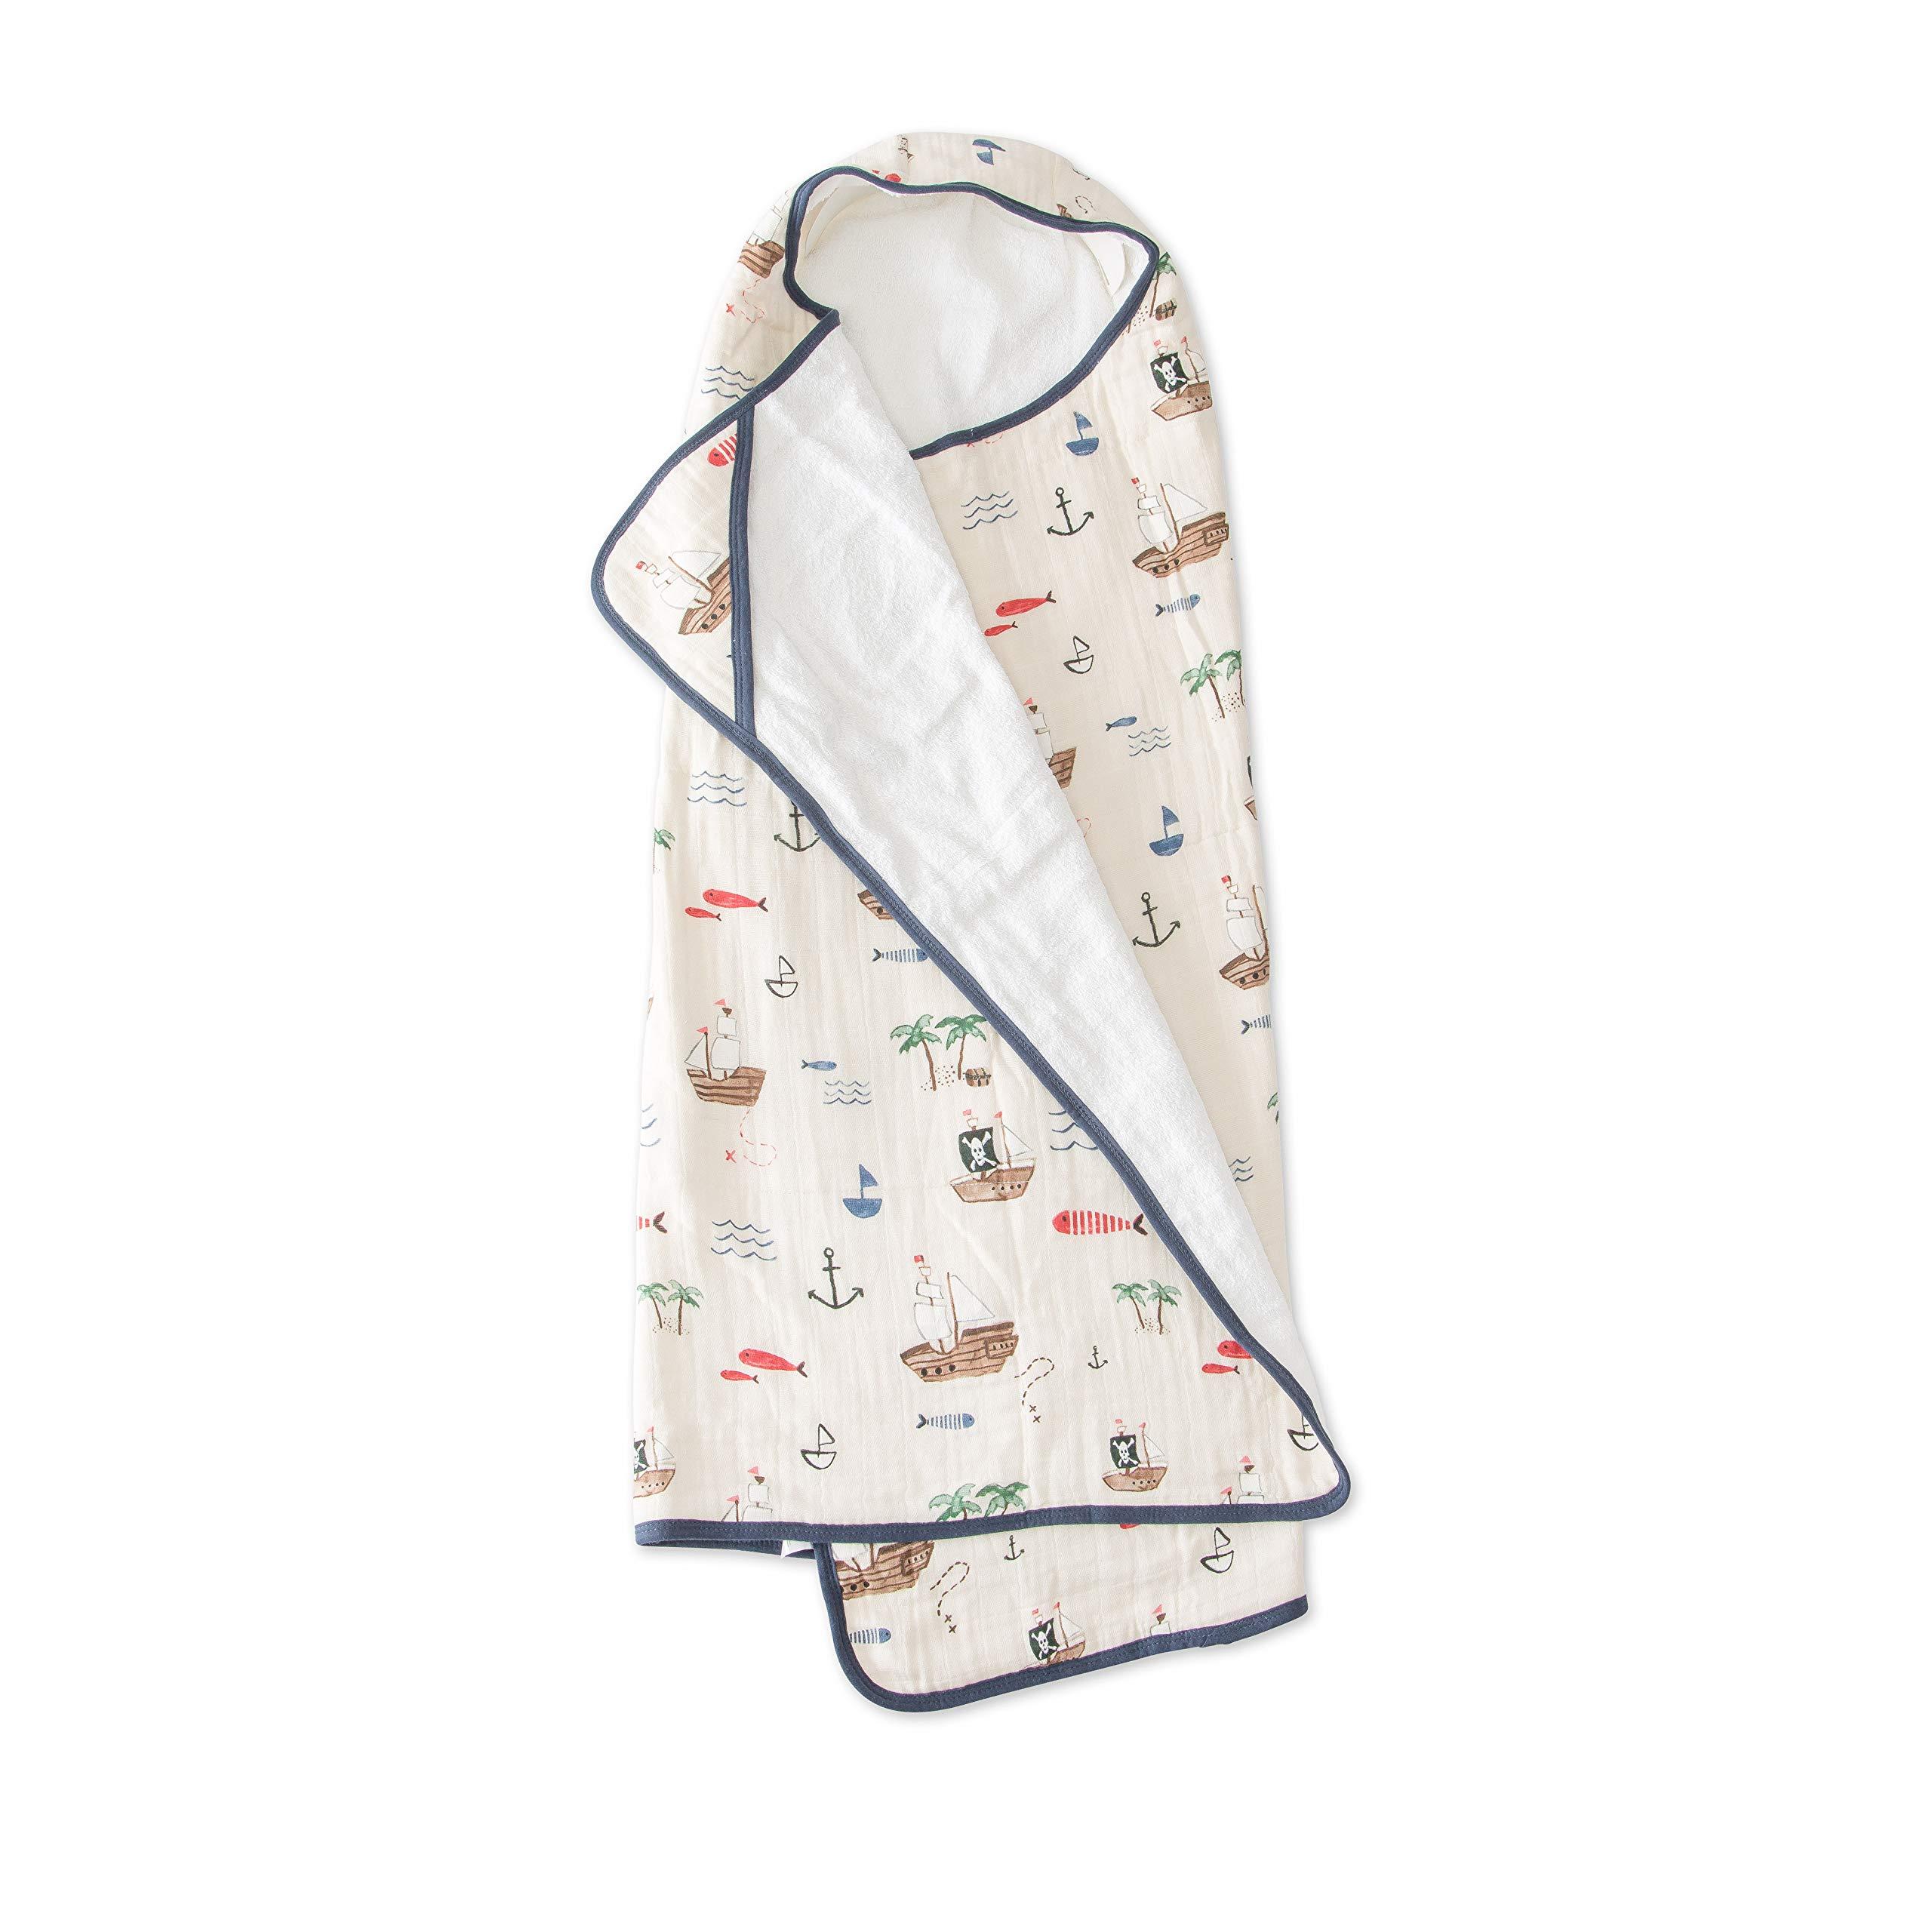 Little Unicorn Large Cotton Hooded Towel - Treasure Map by Little Unicorn (Image #1)